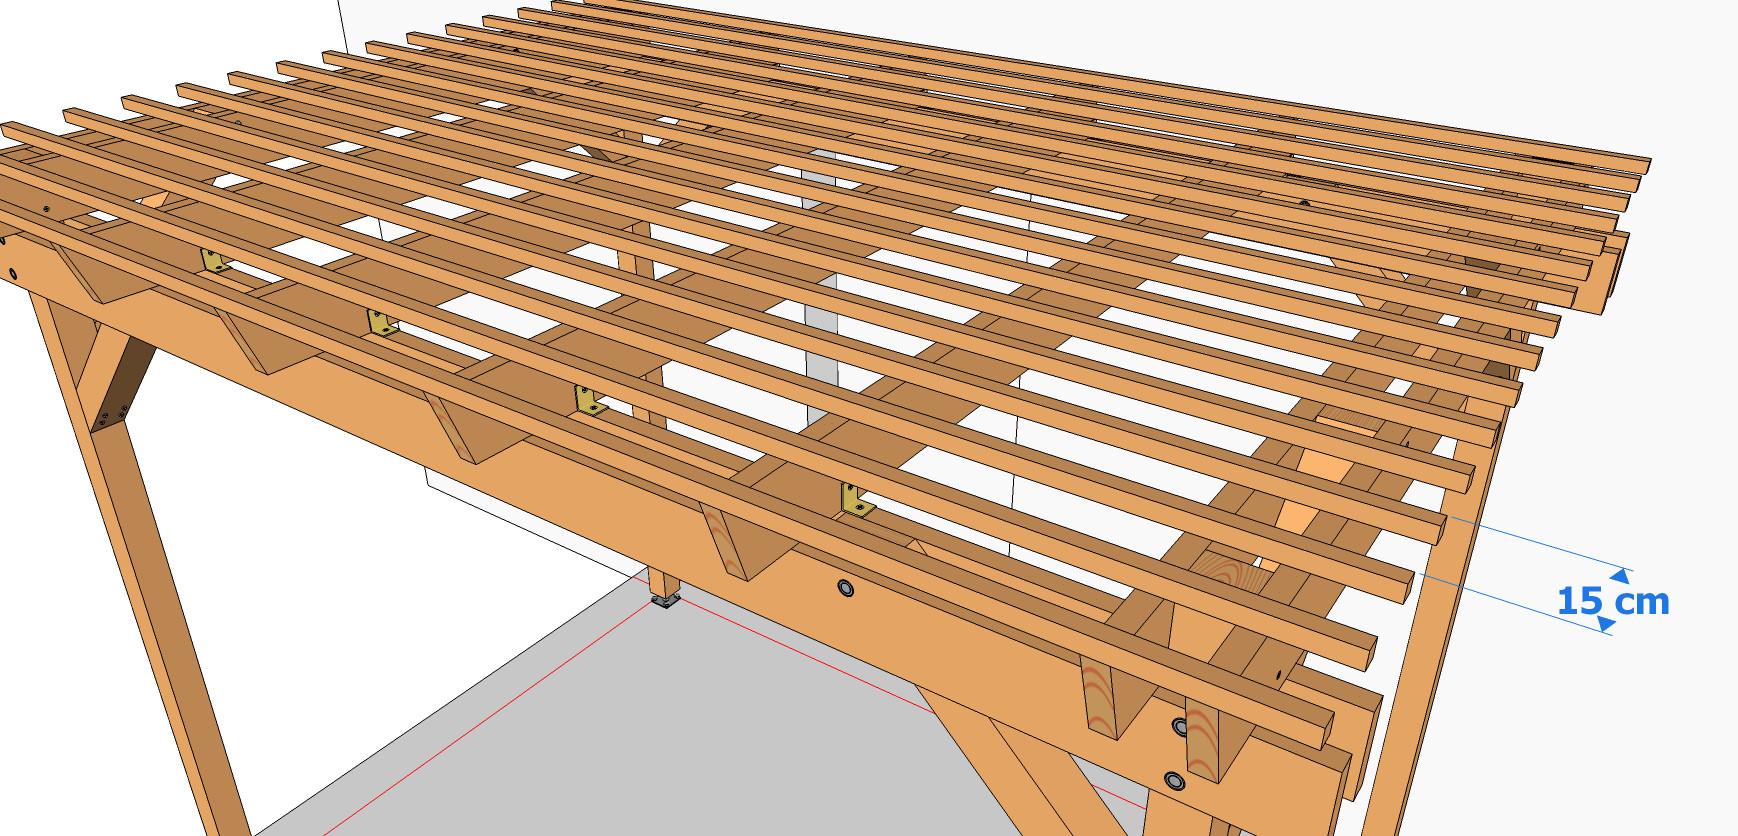 construire un abri de jardin en bois soi meme pergola a faire soi mame of construire un abri de jardin en bois soi meme